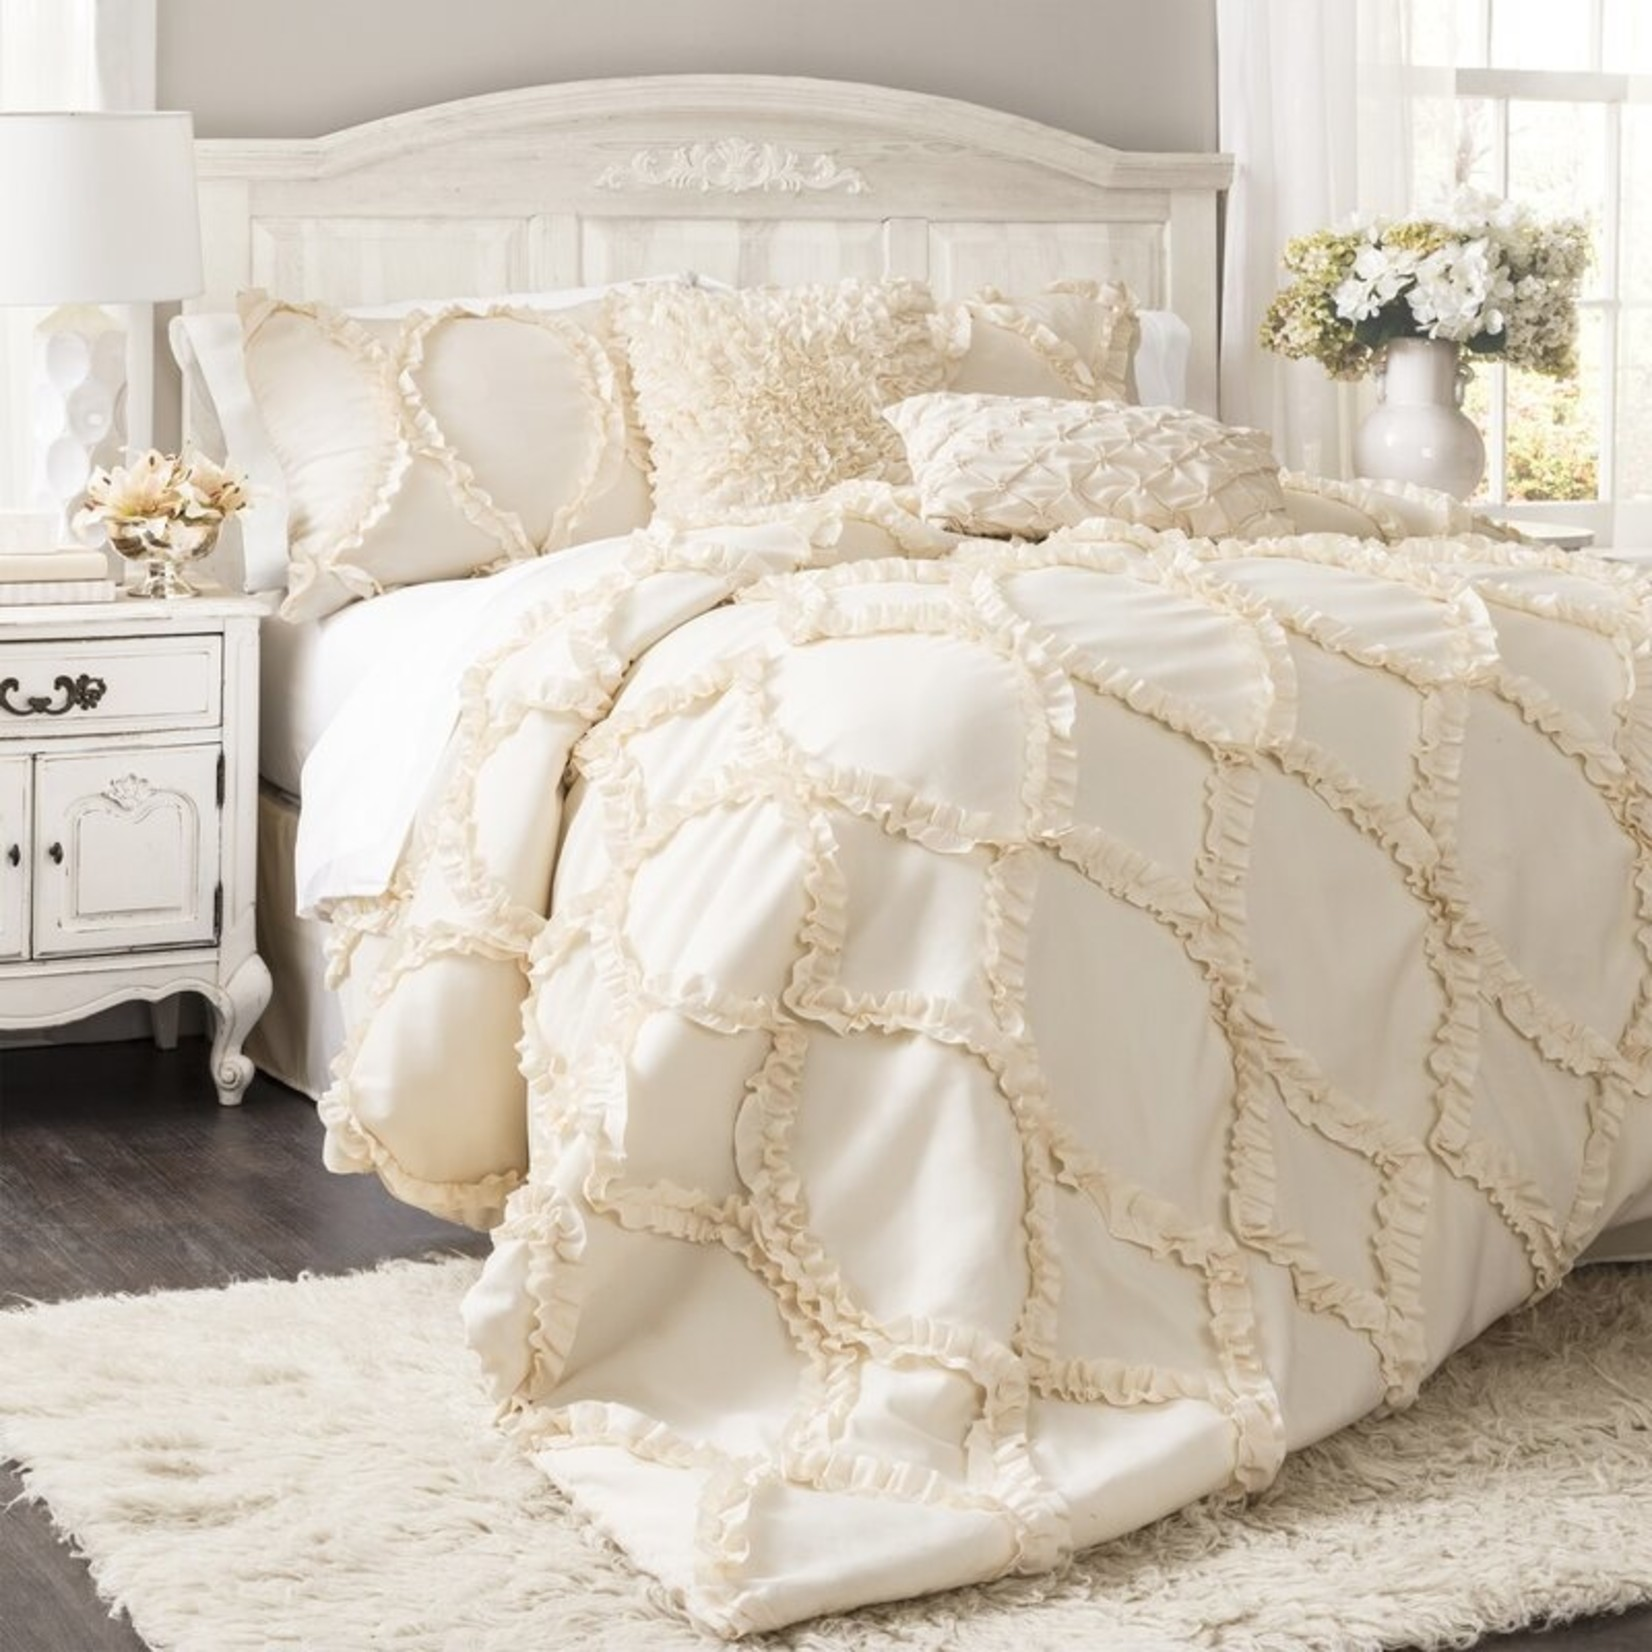 *Queen - Erion 3 Piece Comforter Set - Ivory - Final Sale